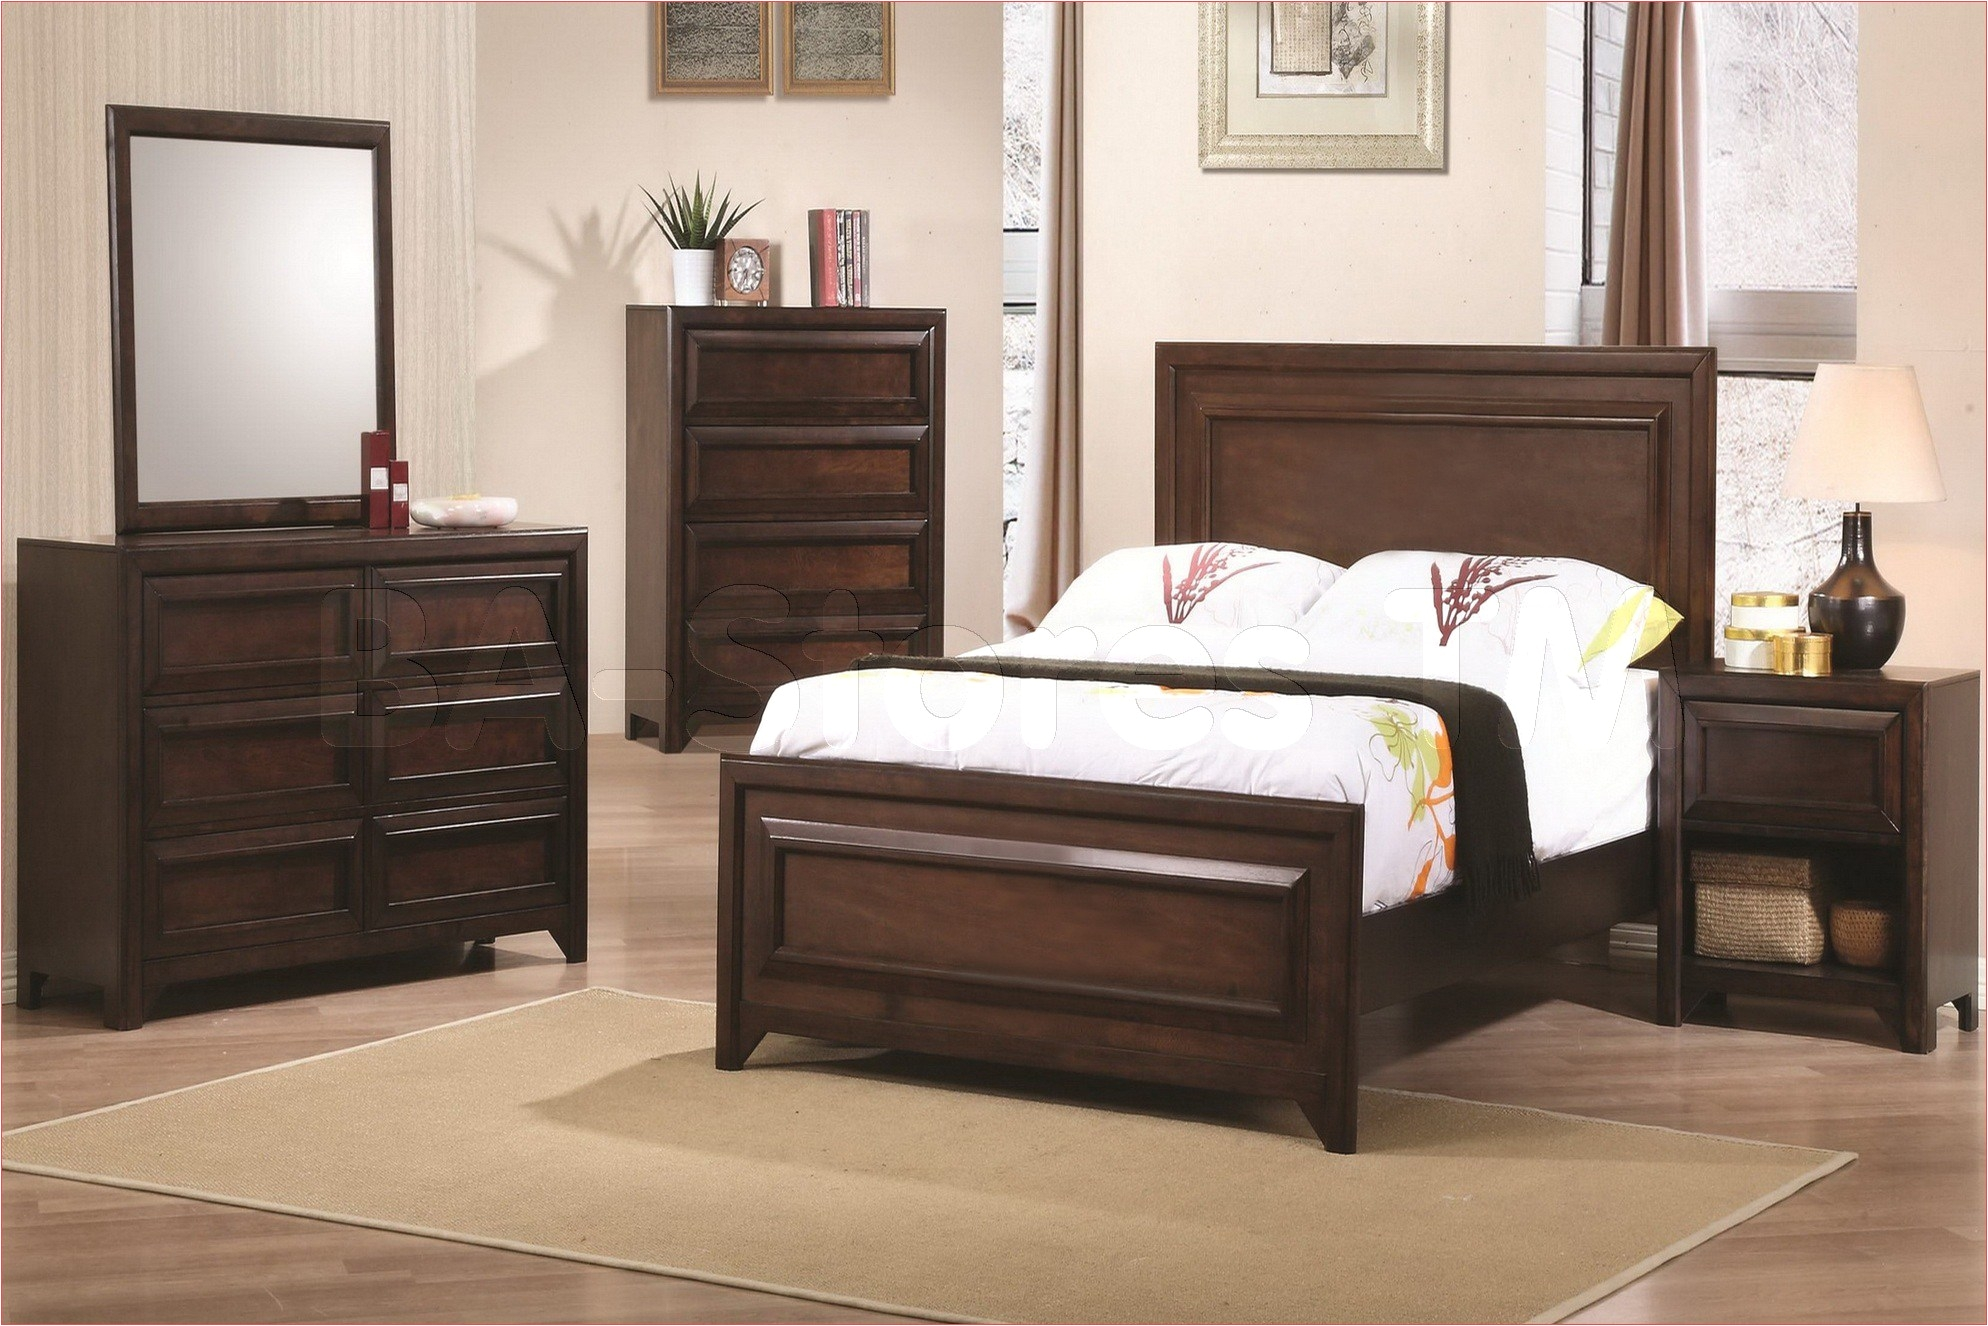 twin bedroom furniture sets for adults bedroom sets